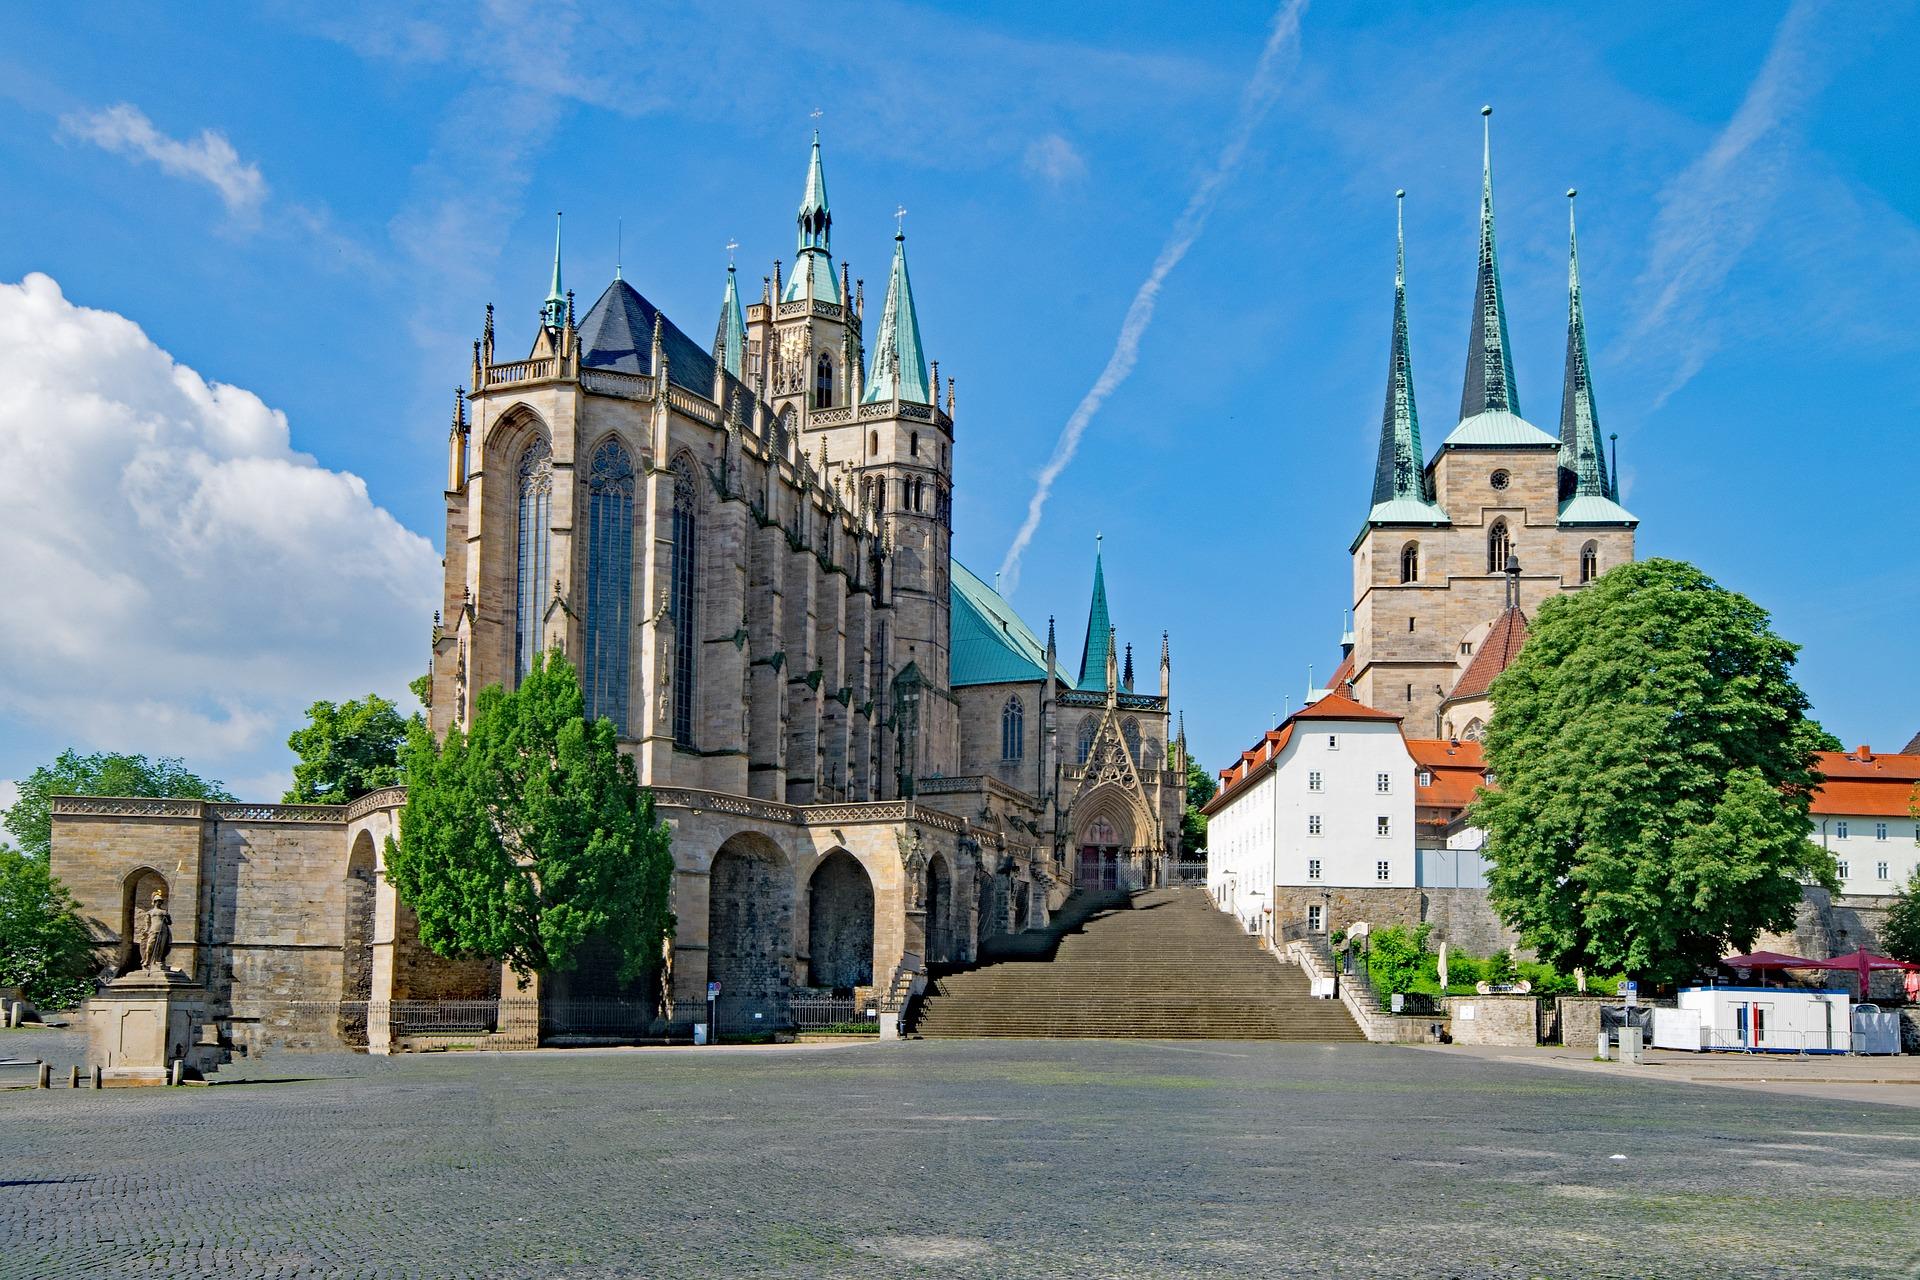 erfurt-cathedral-2375431_1920